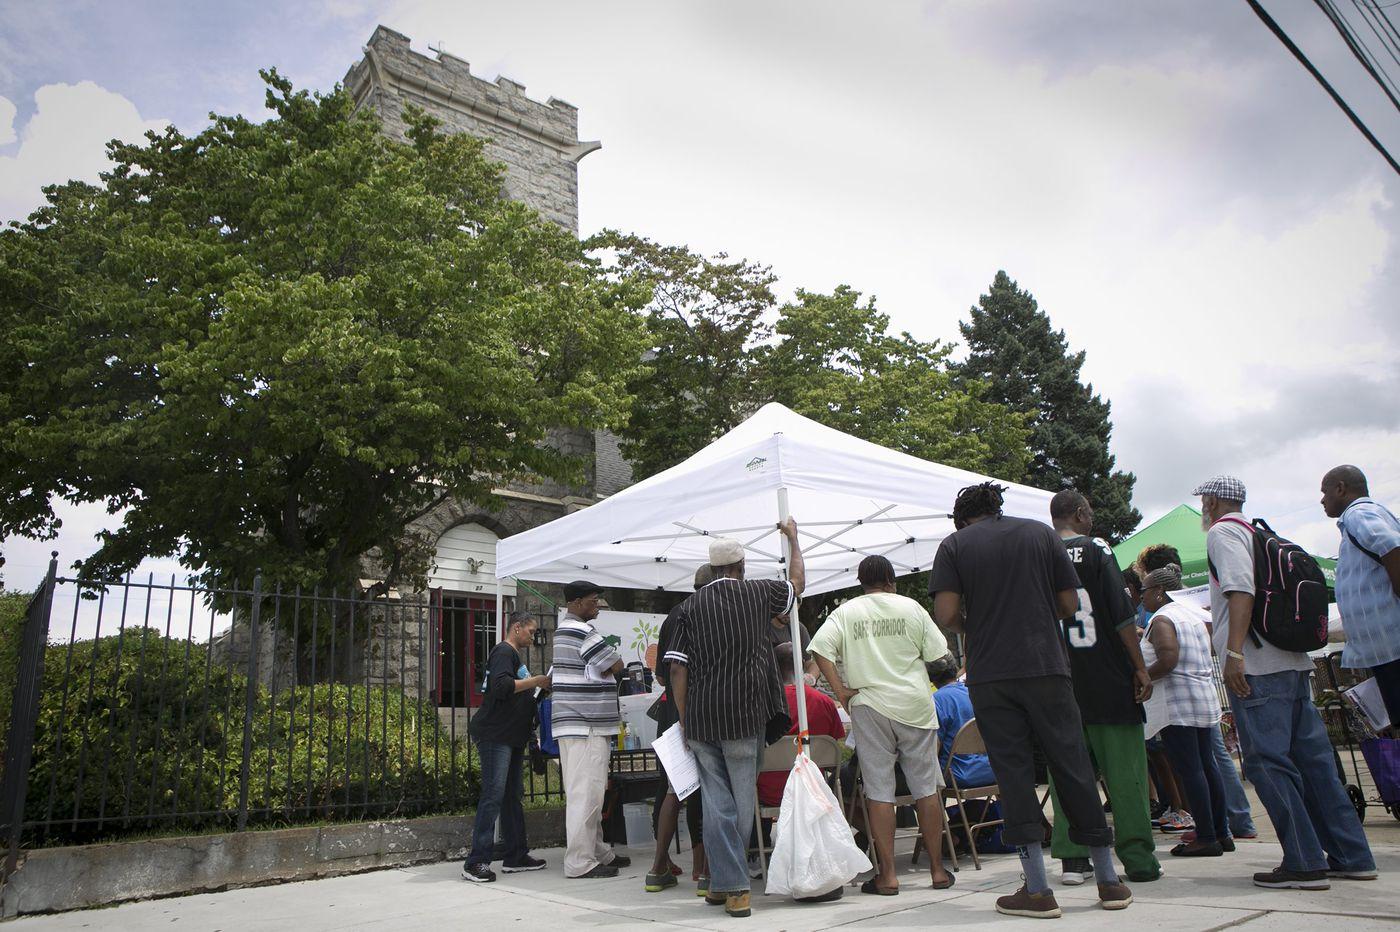 Report: Hunger in Philadelphia increases 22 percent